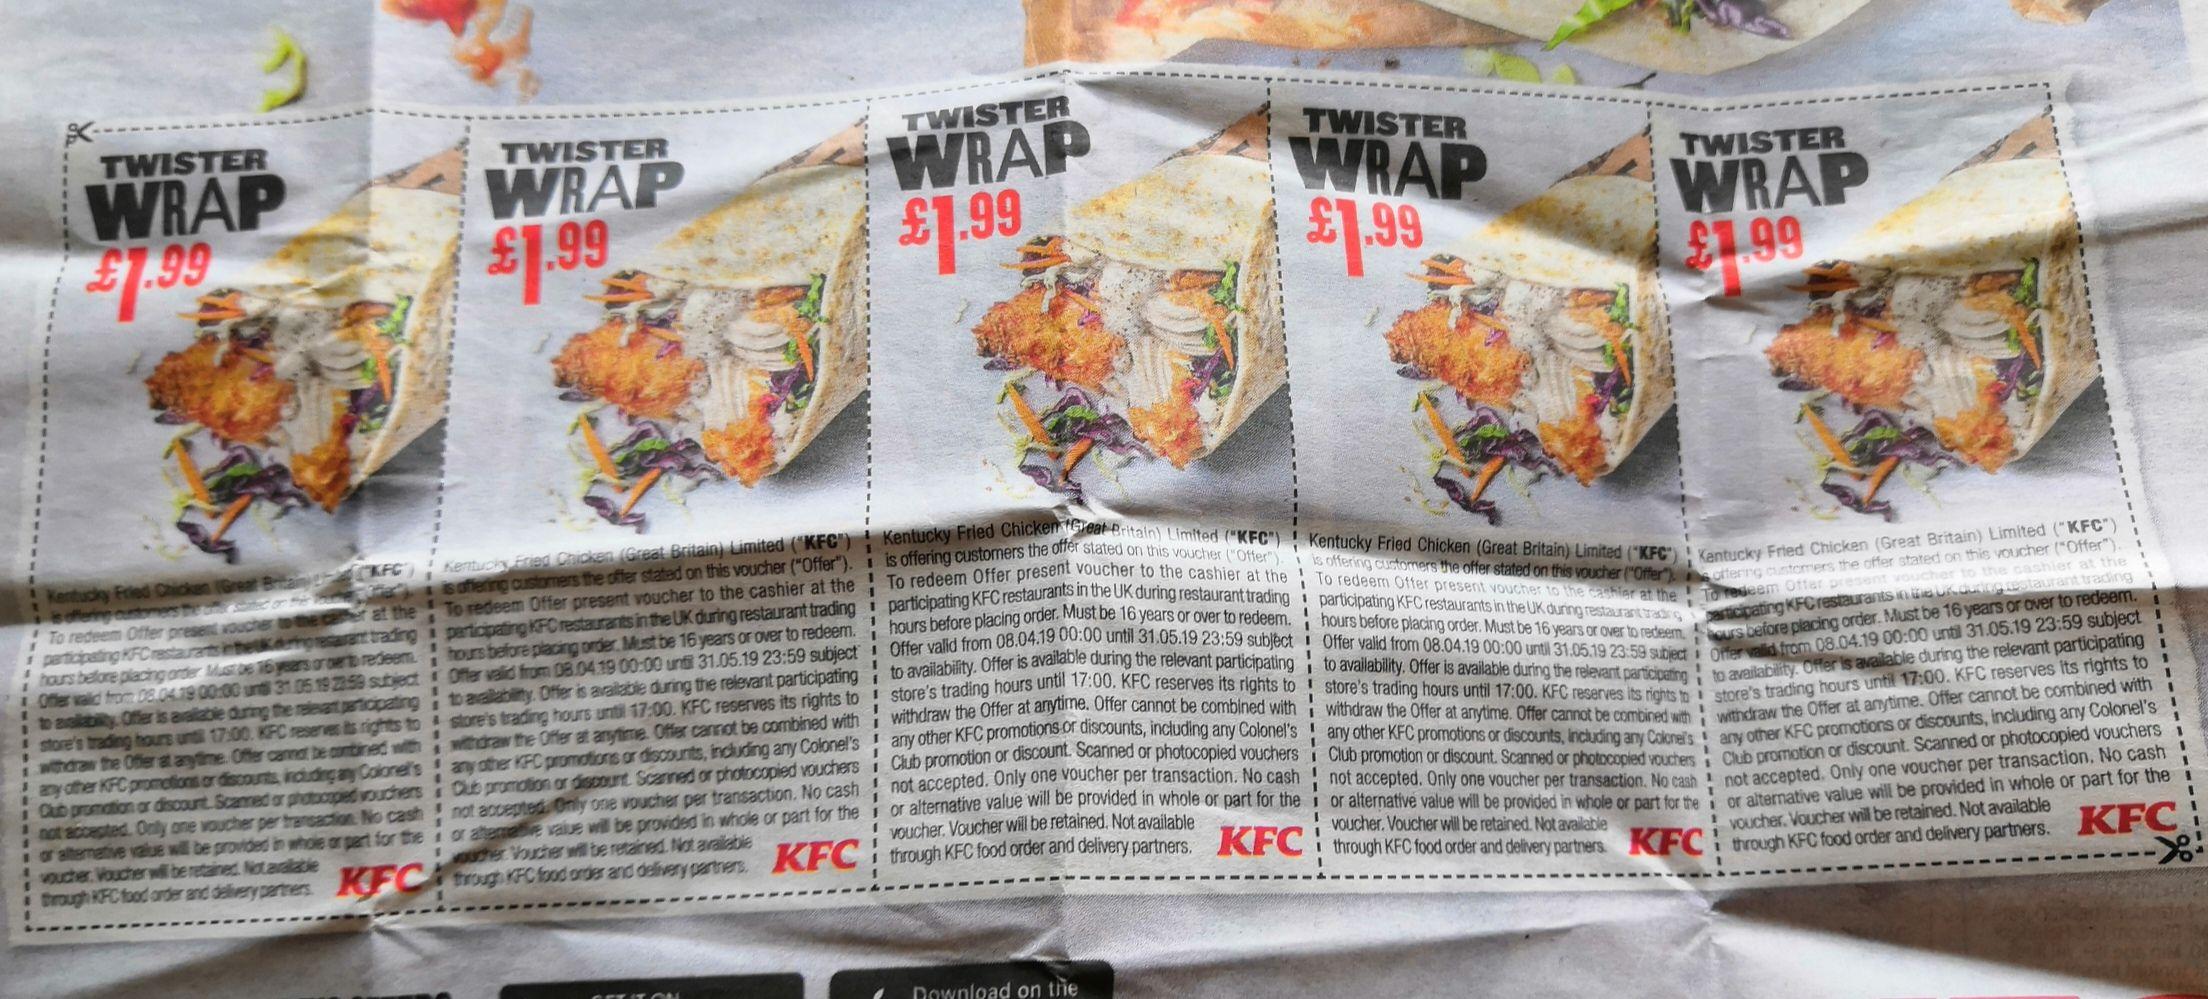 KFC Twister wrap £1.99 using voucher in the Mirror & Metro